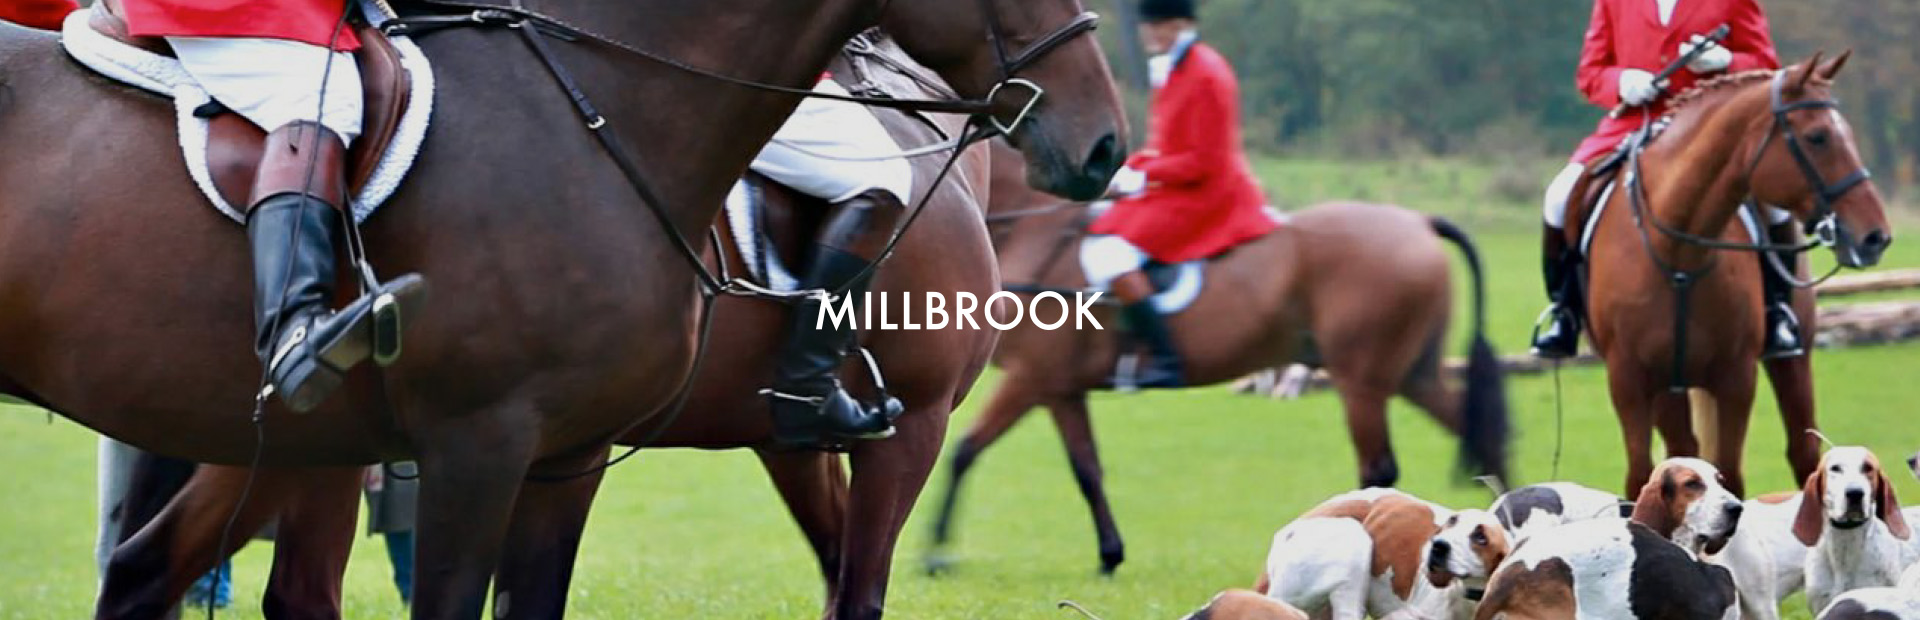 bluprint-case-studies-houlihan-lawrence-millbrook.jpg